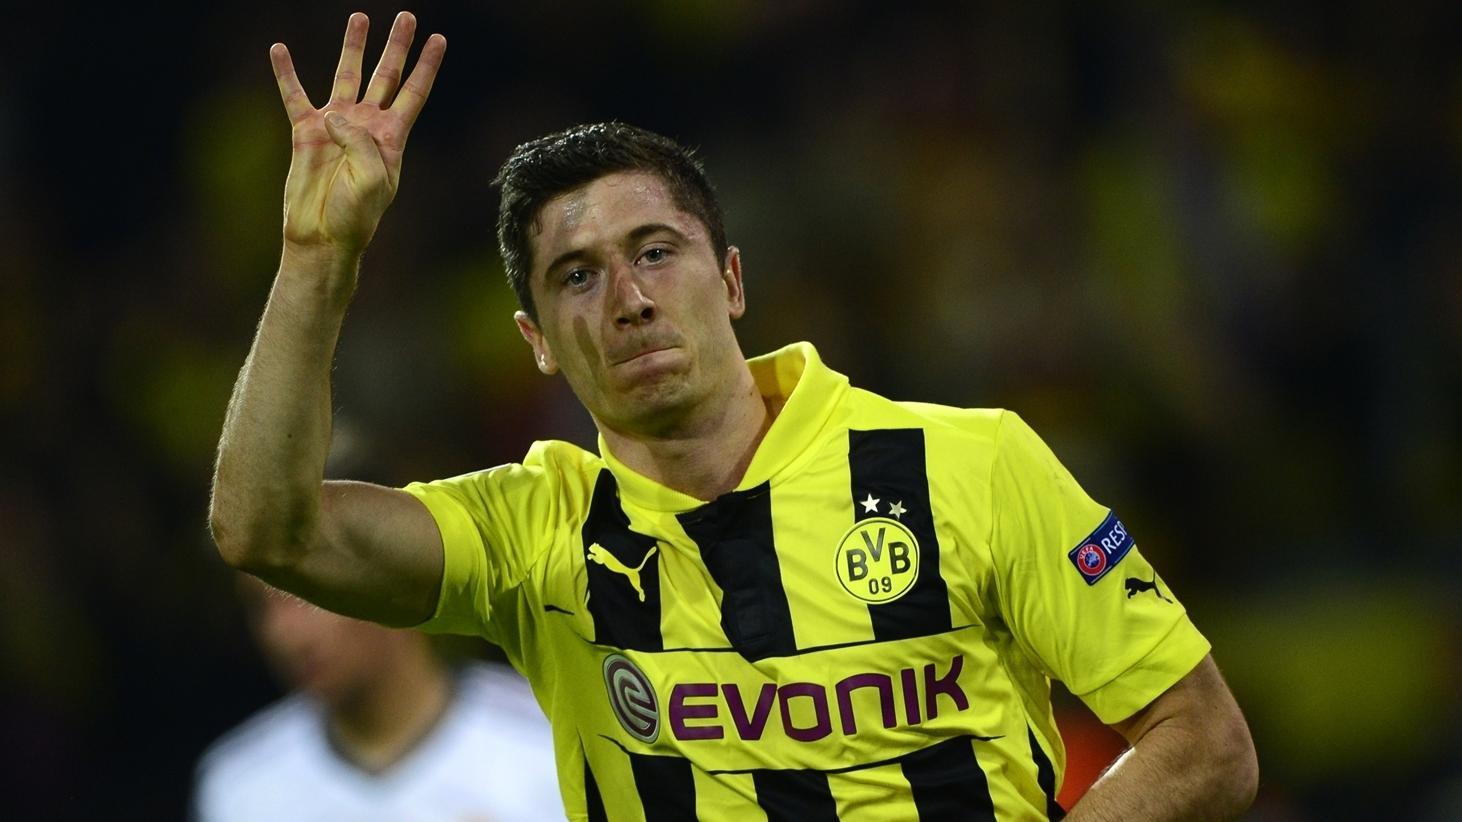 Who are Robert Lewandowski's favourite opponents? | UEFA Champions League | UEFA.com